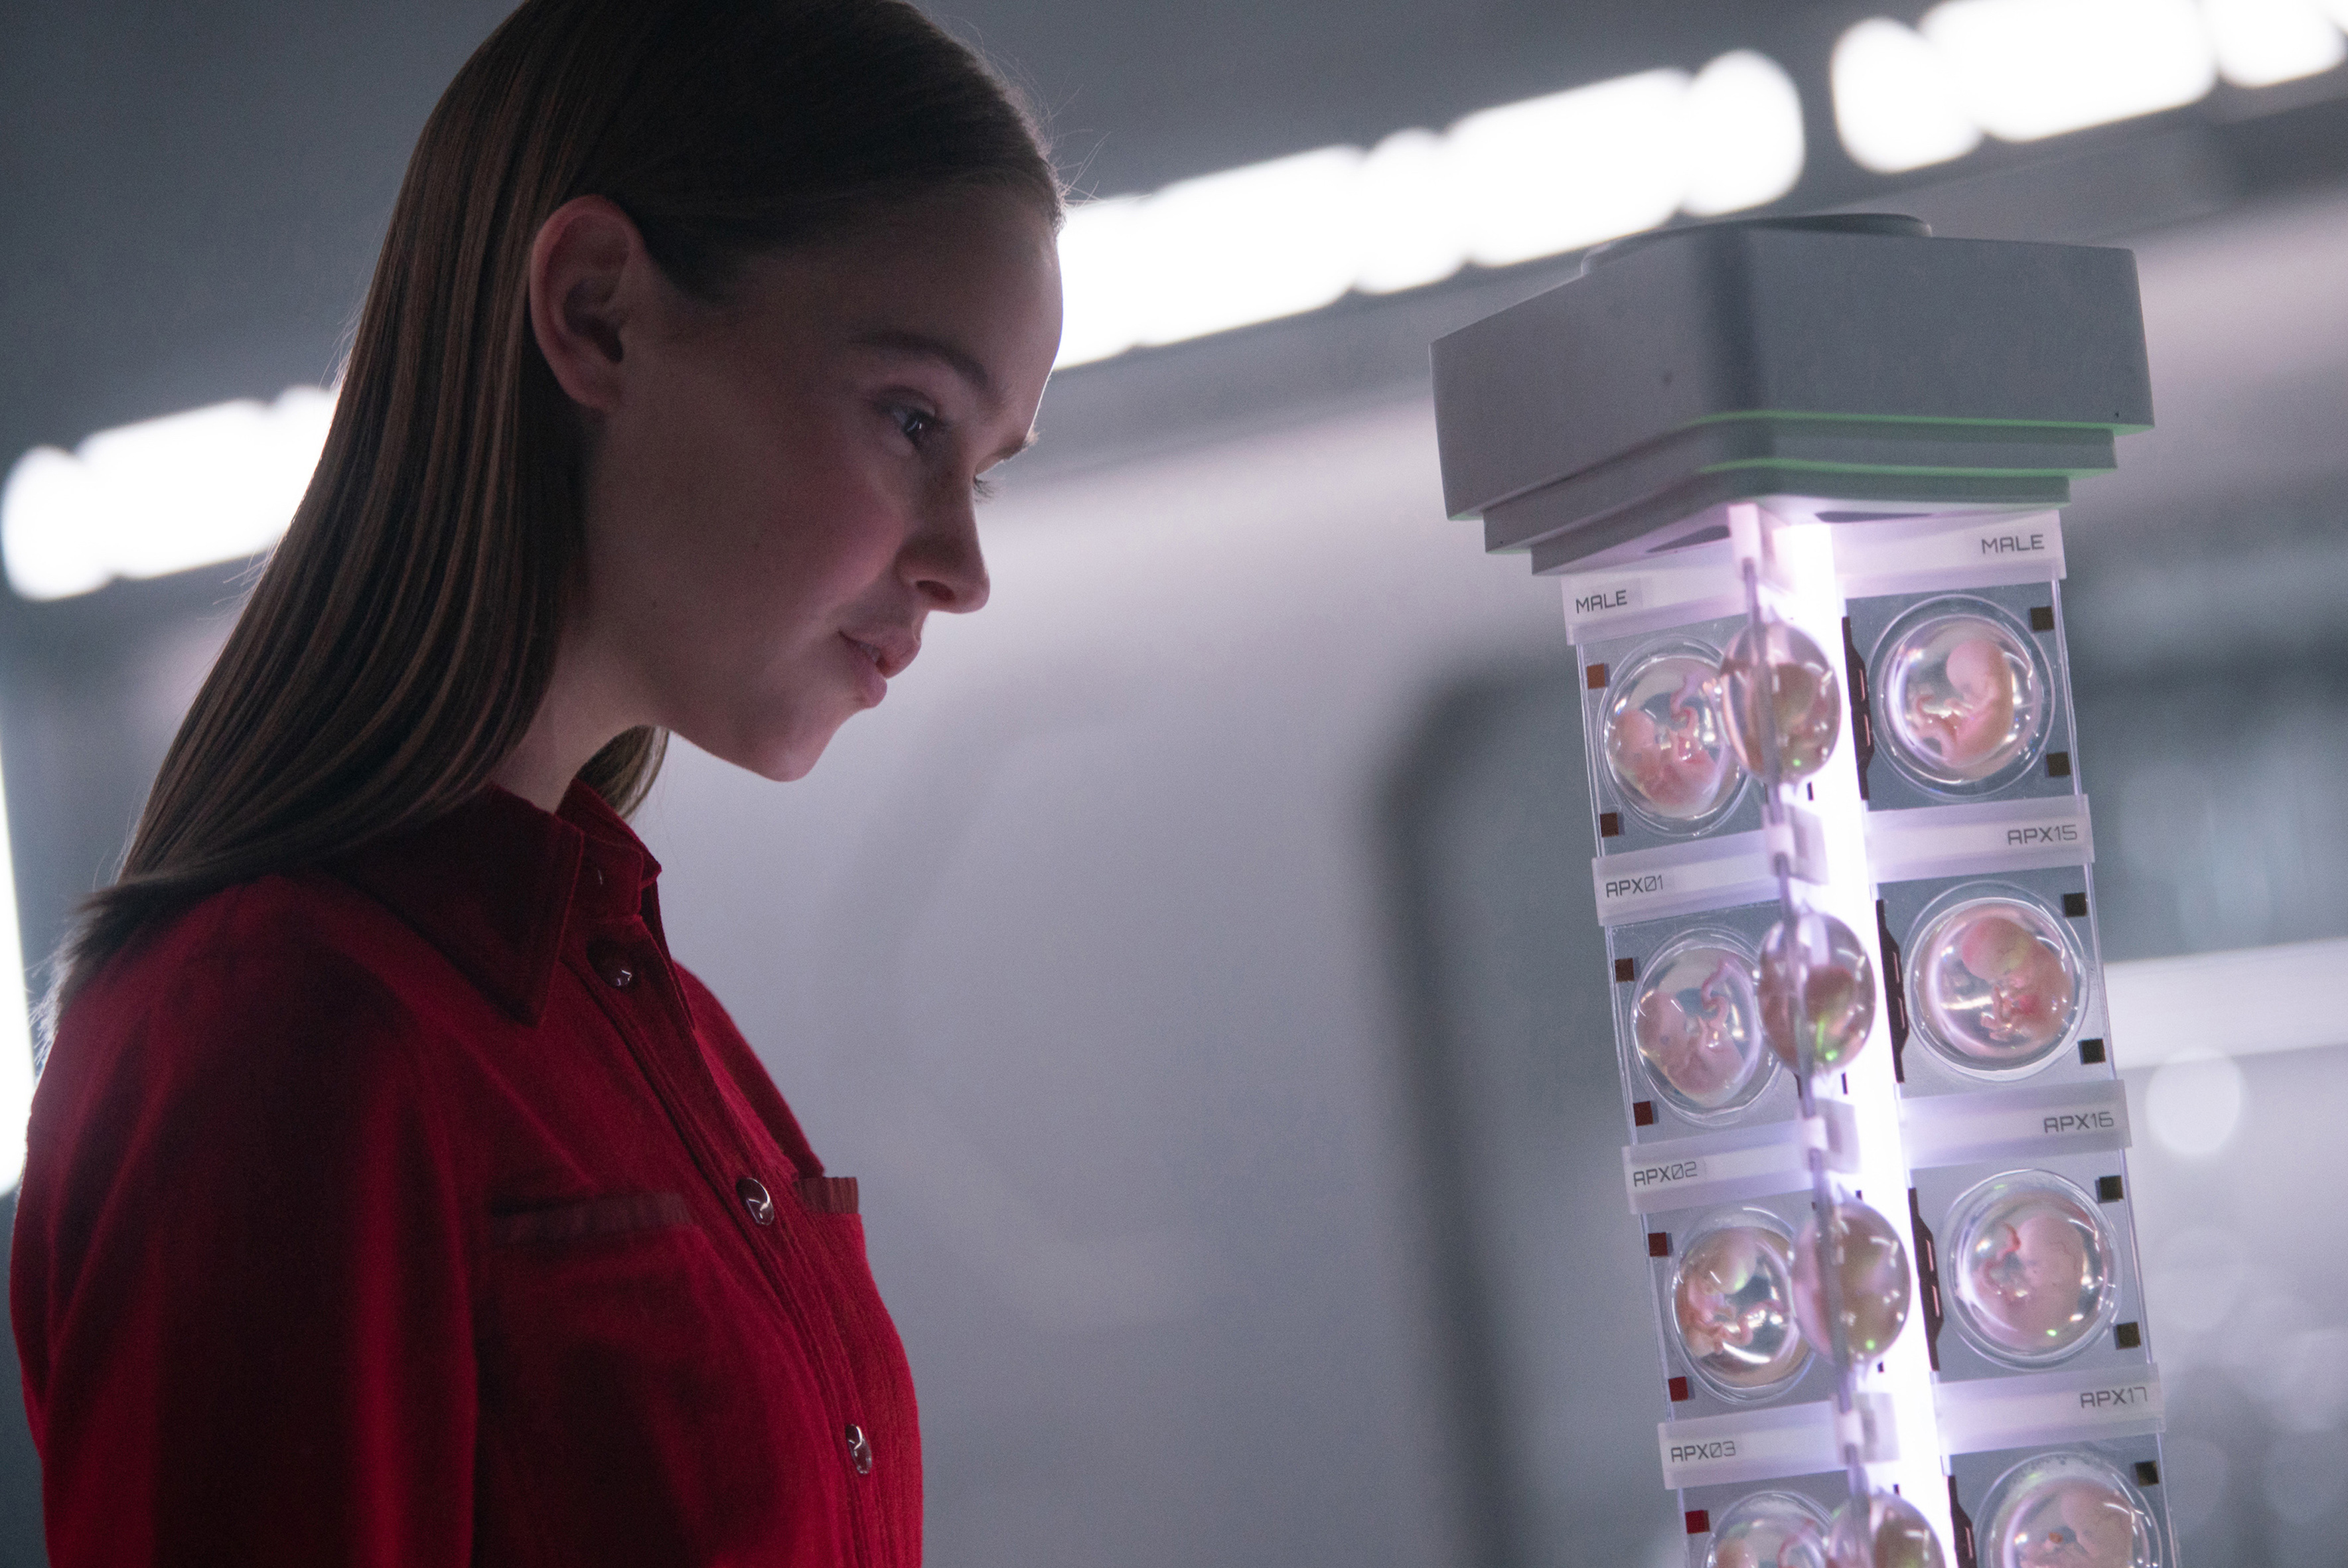 A still from the Netflix film I Am Mother